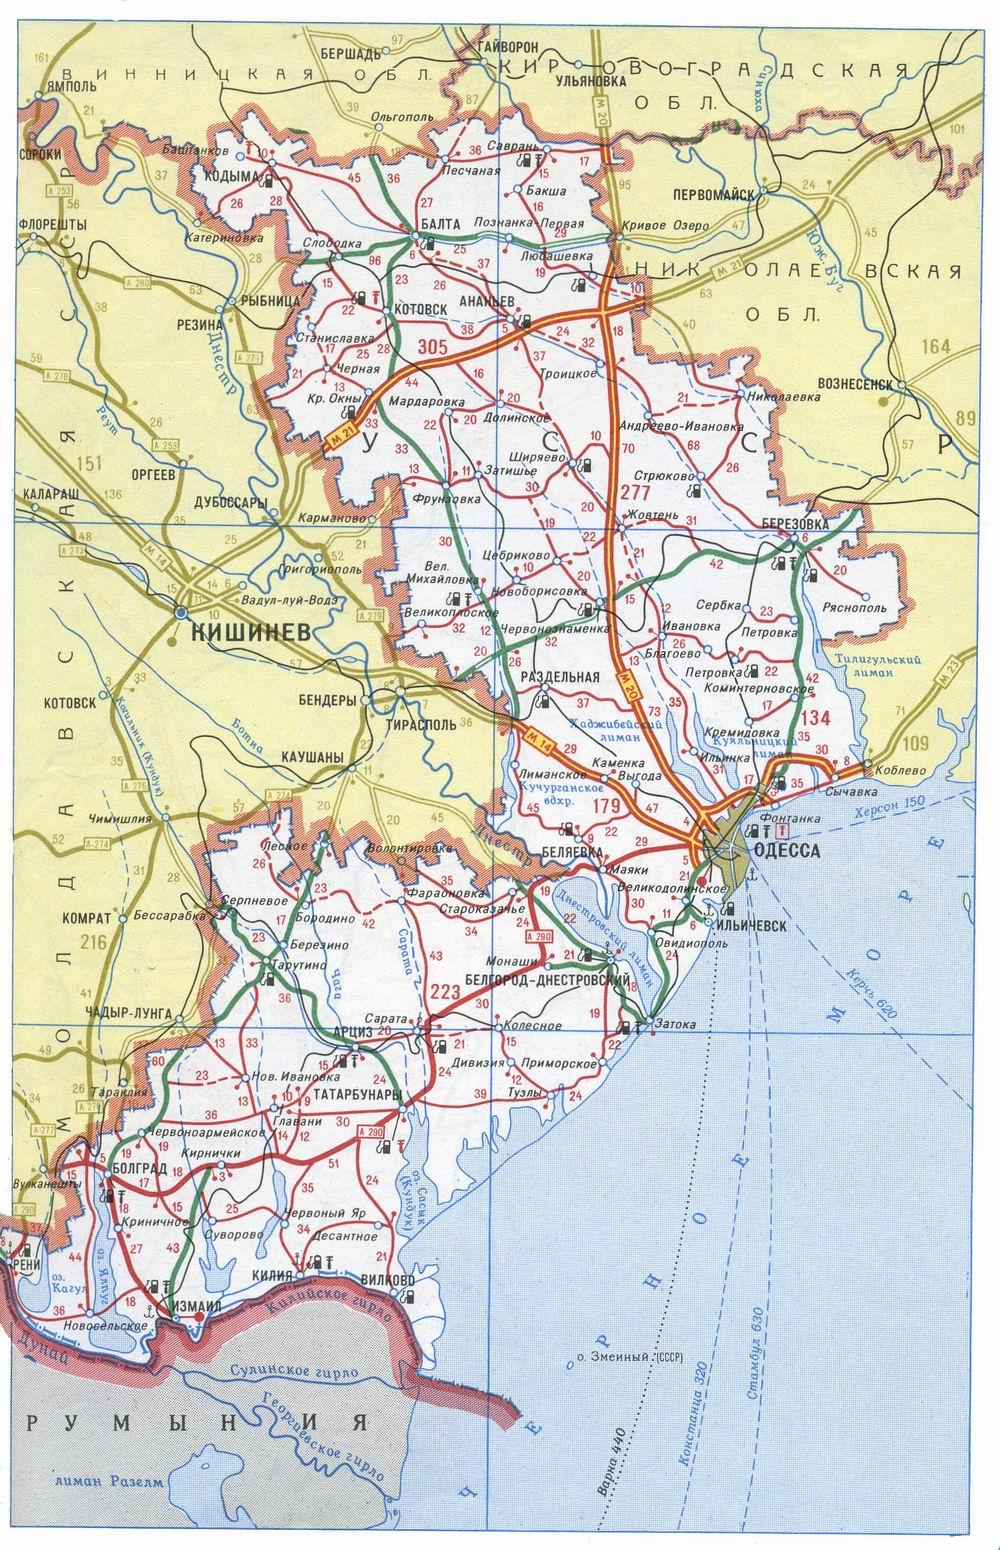 Карта Транспорта Кишинев - tdkorsar: http://tdkorsar.weebly.com/blog/karta-transporta-kishinev